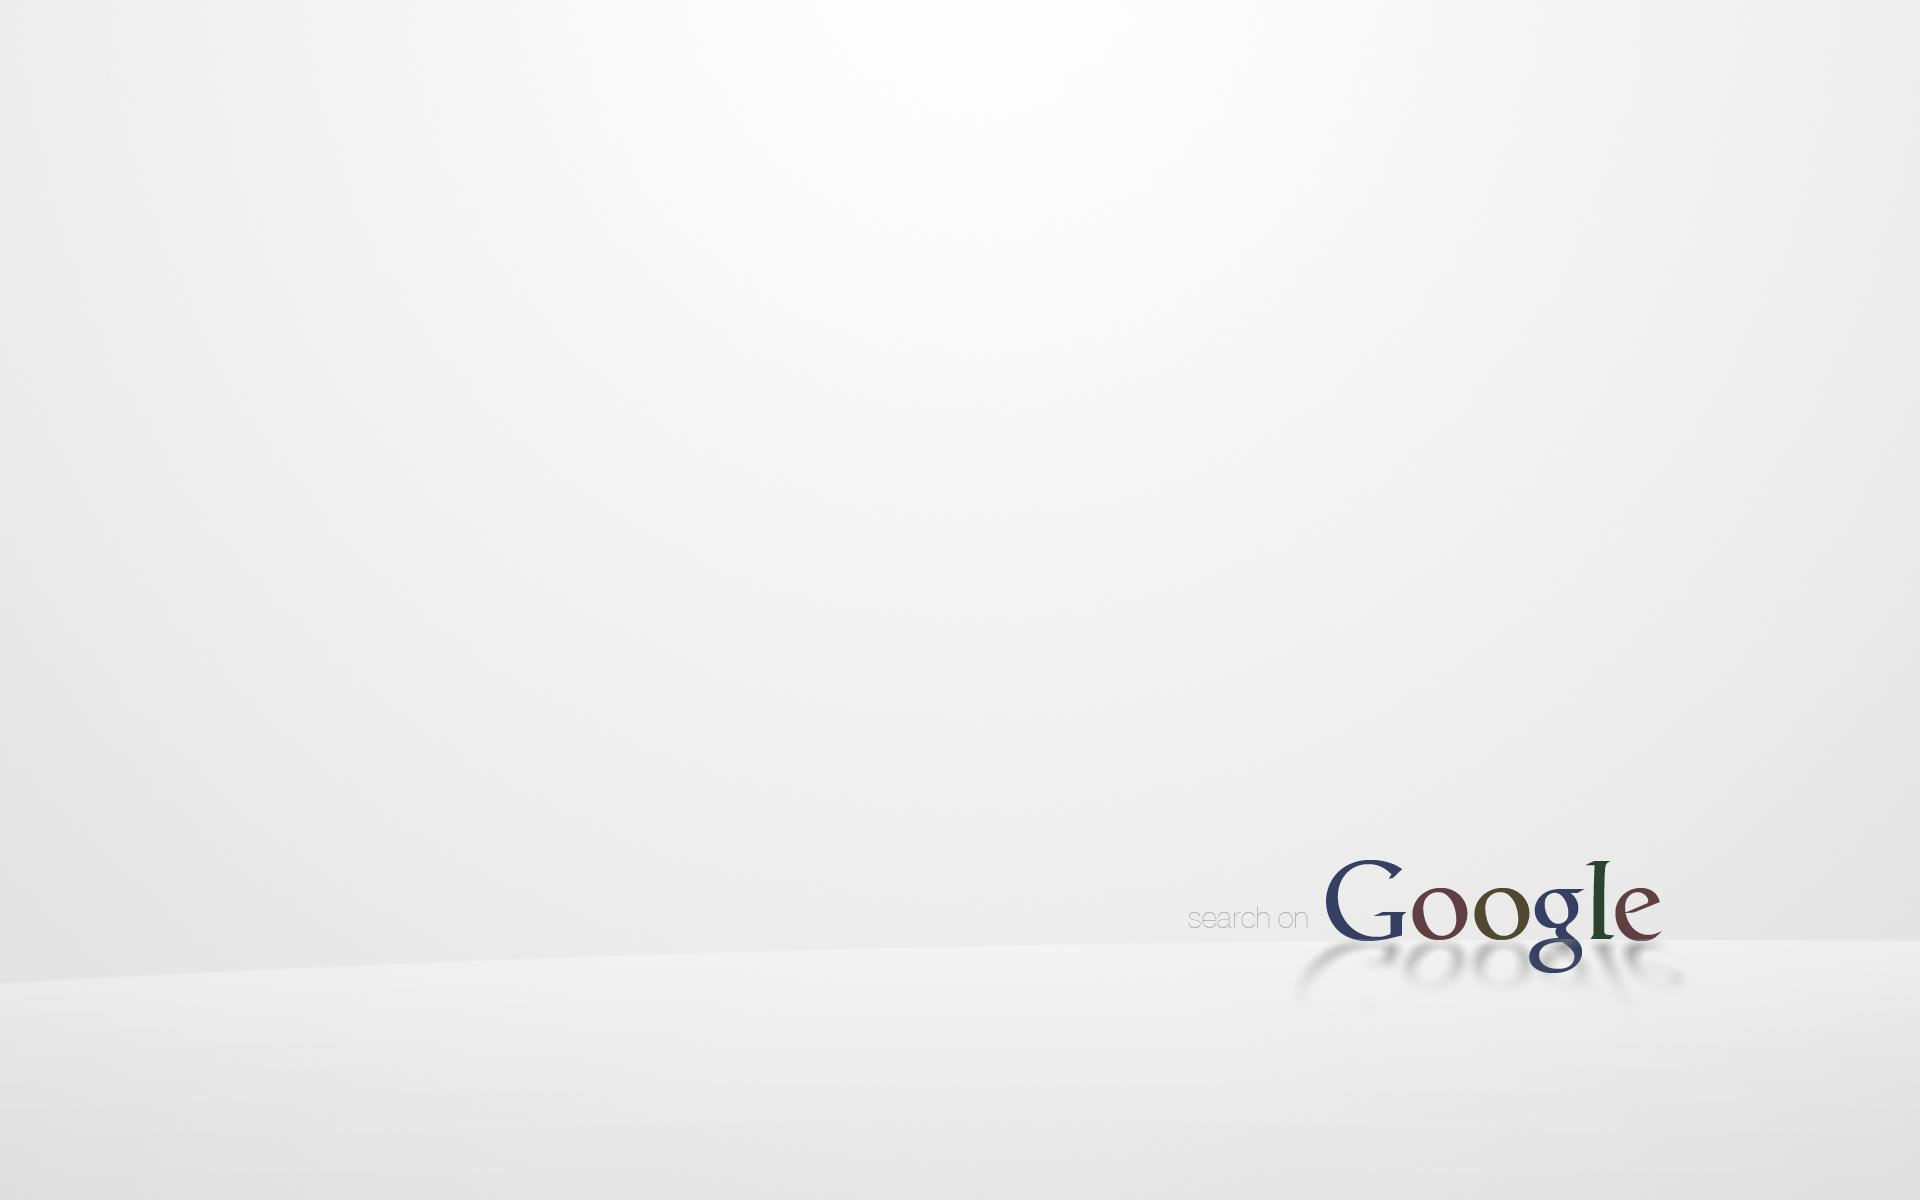 Google Backgrounds 1920x1200